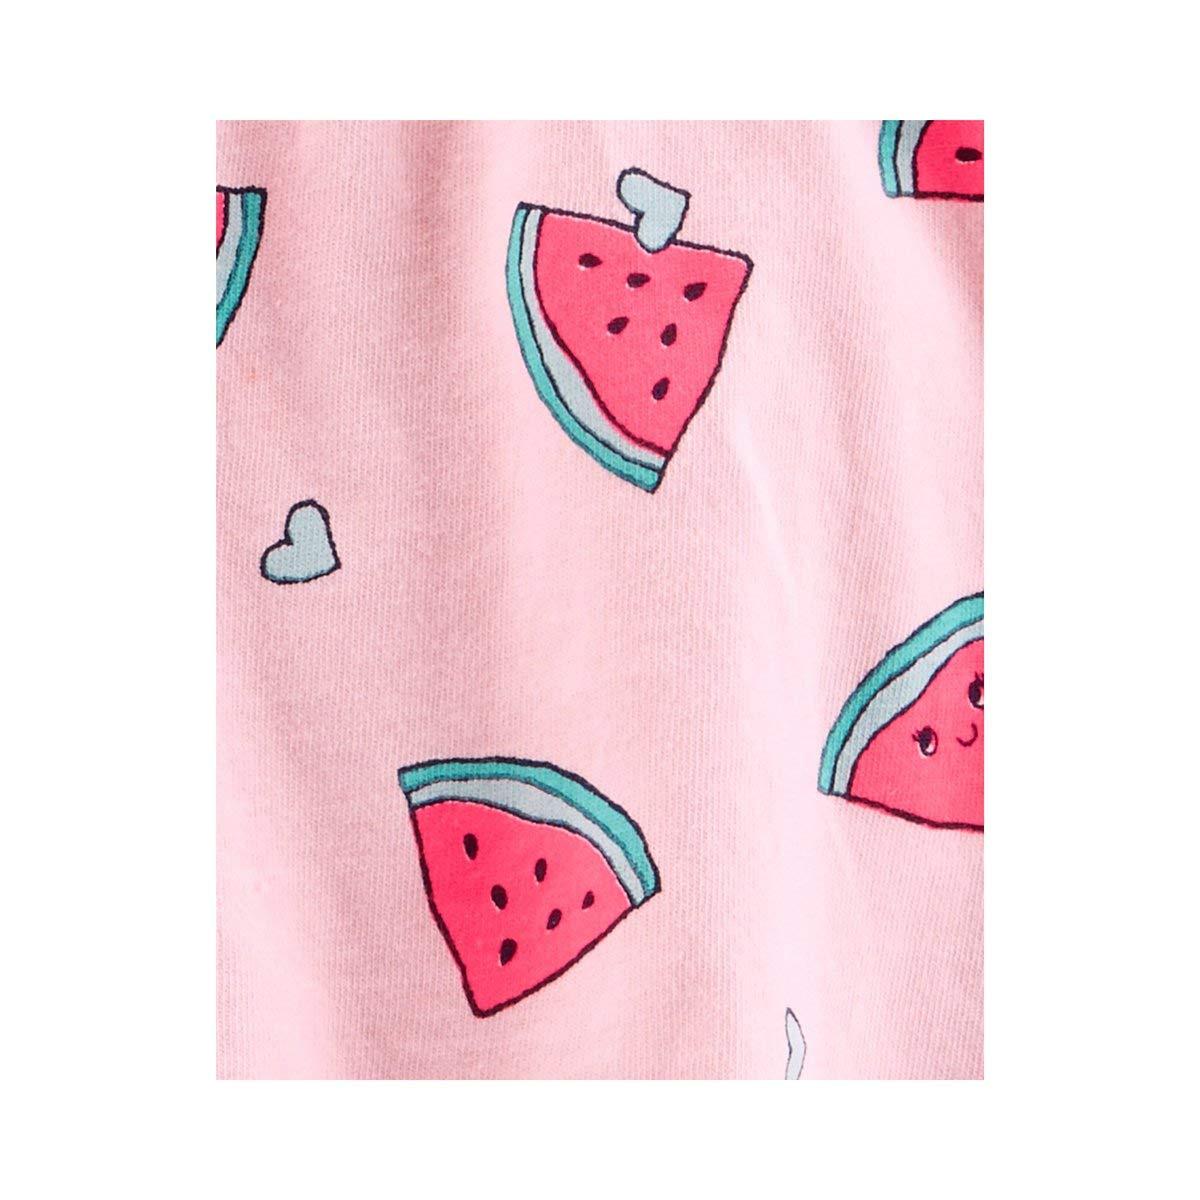 Carters Baby Girls Cotton Watermelon Sunsuit Pink Multi 24 Months